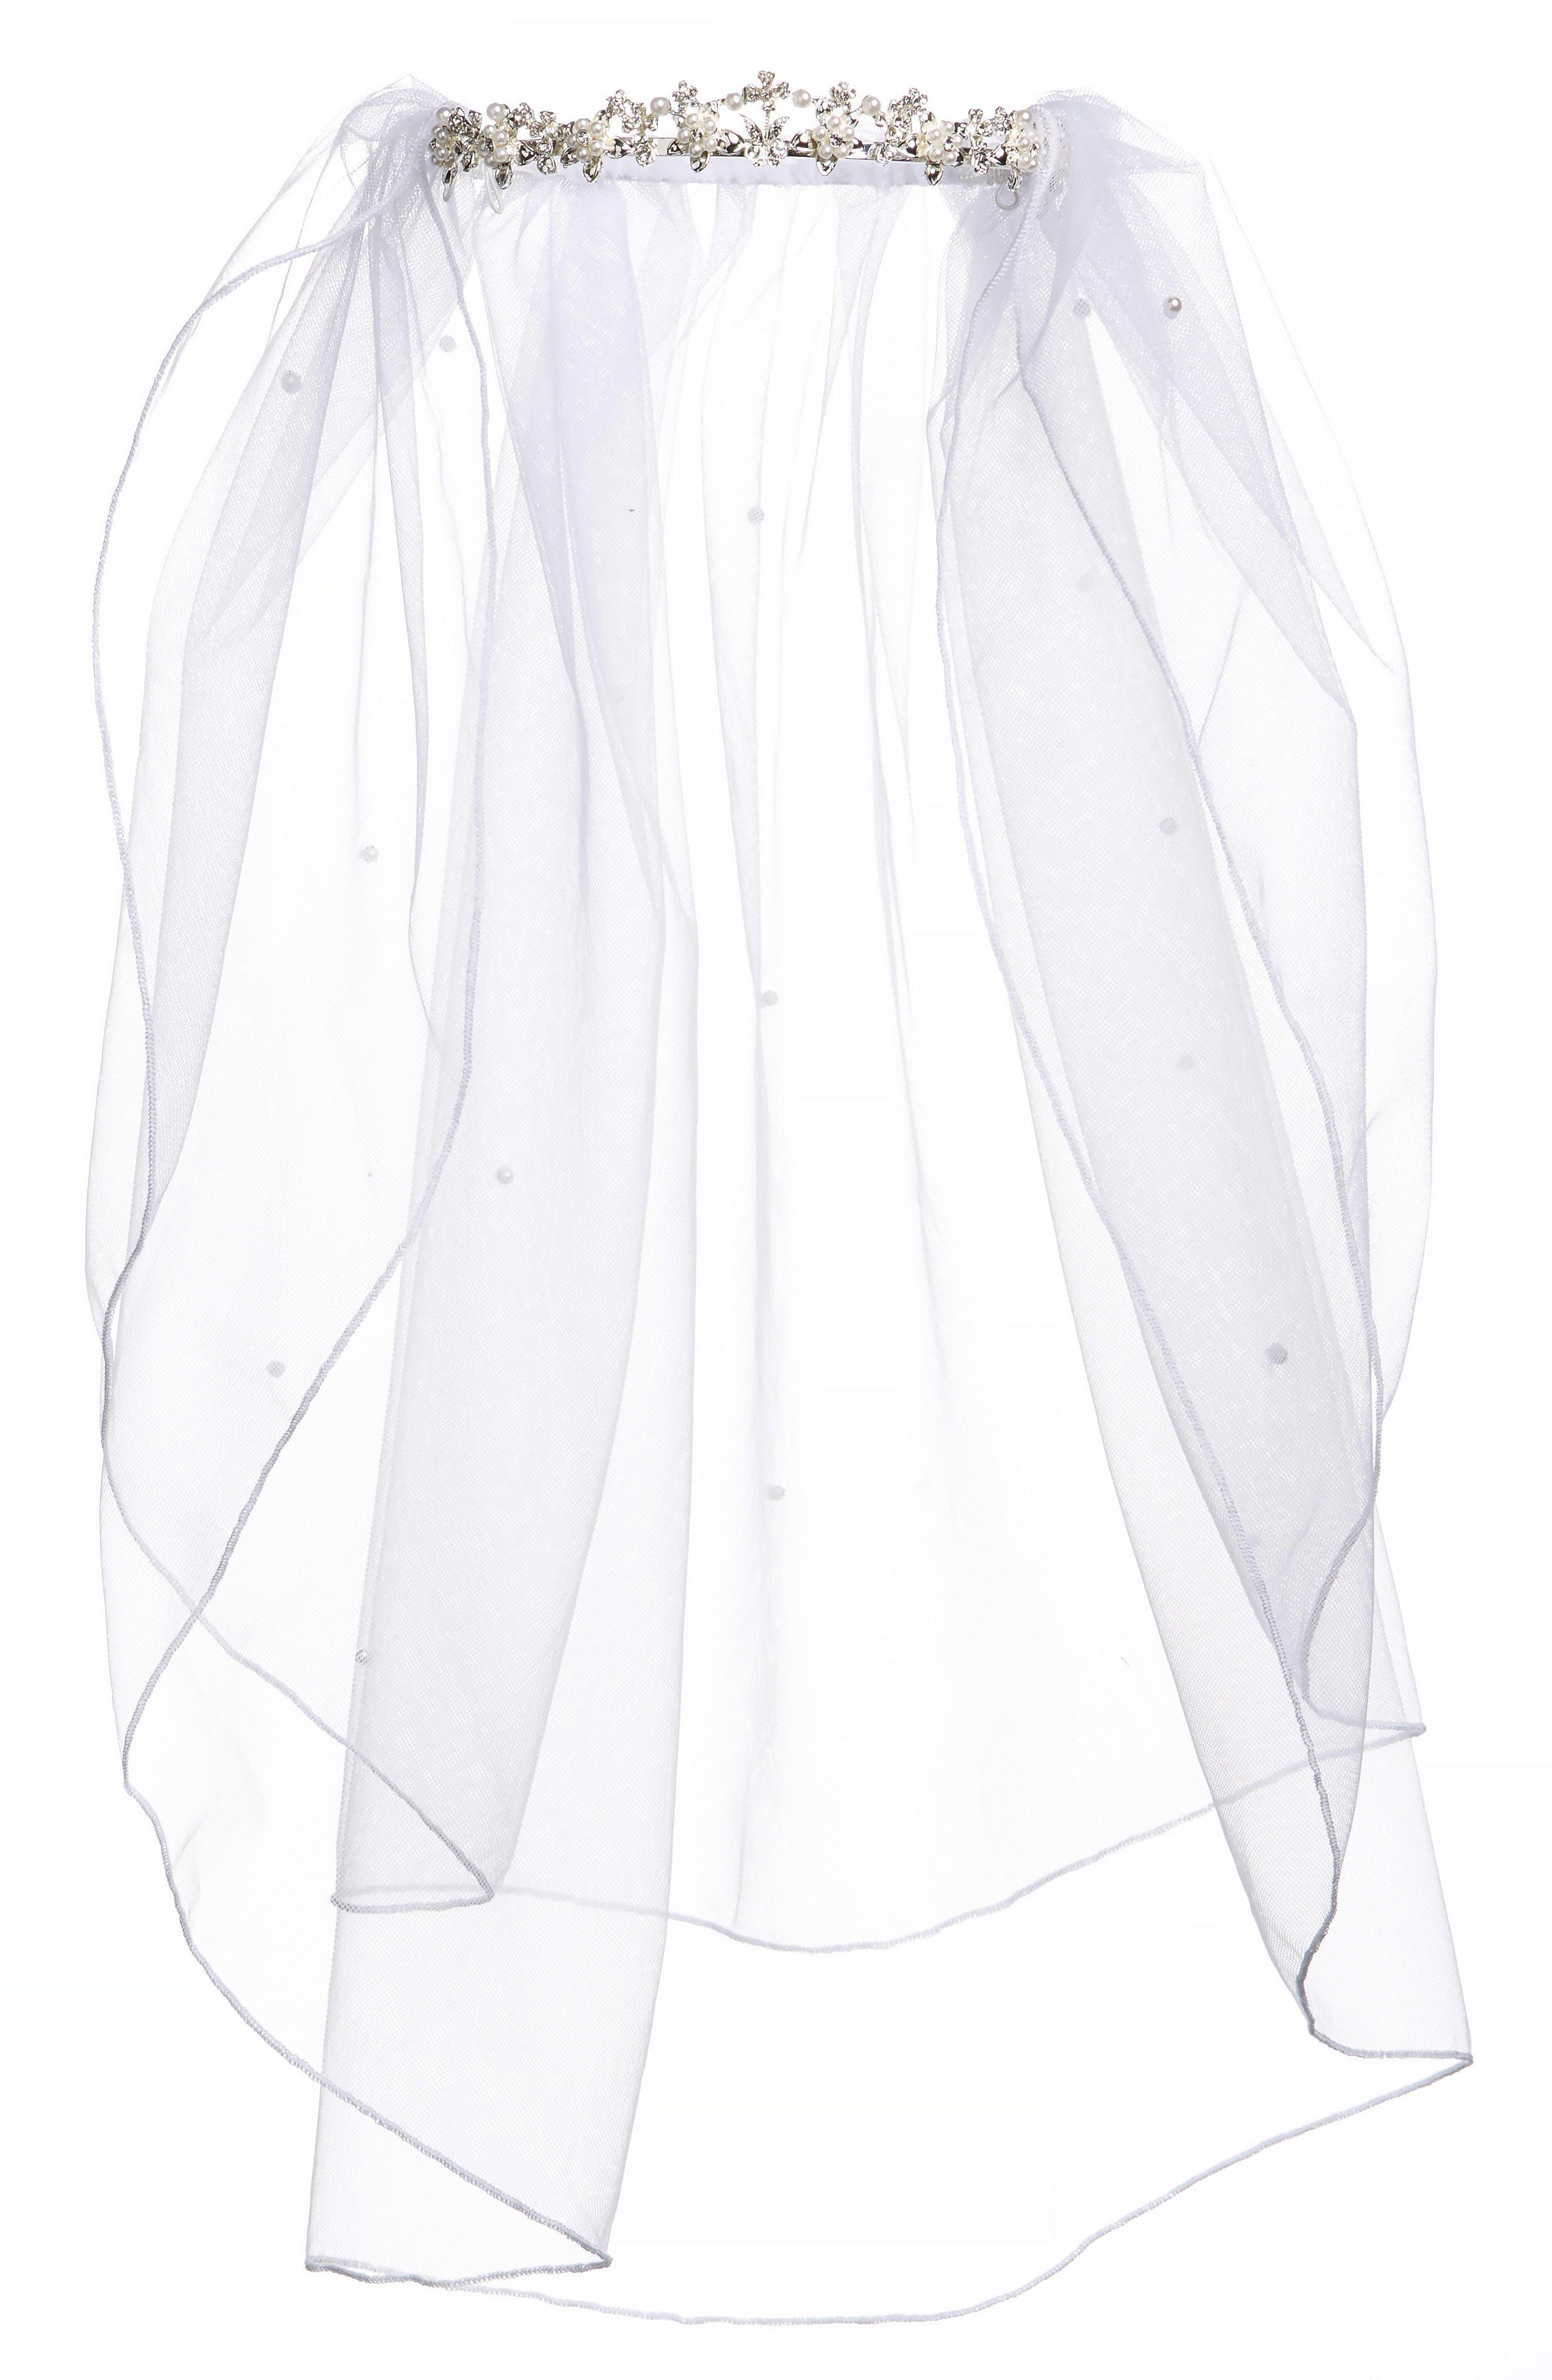 Alternate Image 1 Selected - Lauren Marie Imitation Pearl Crown & Veil (Big Girls)